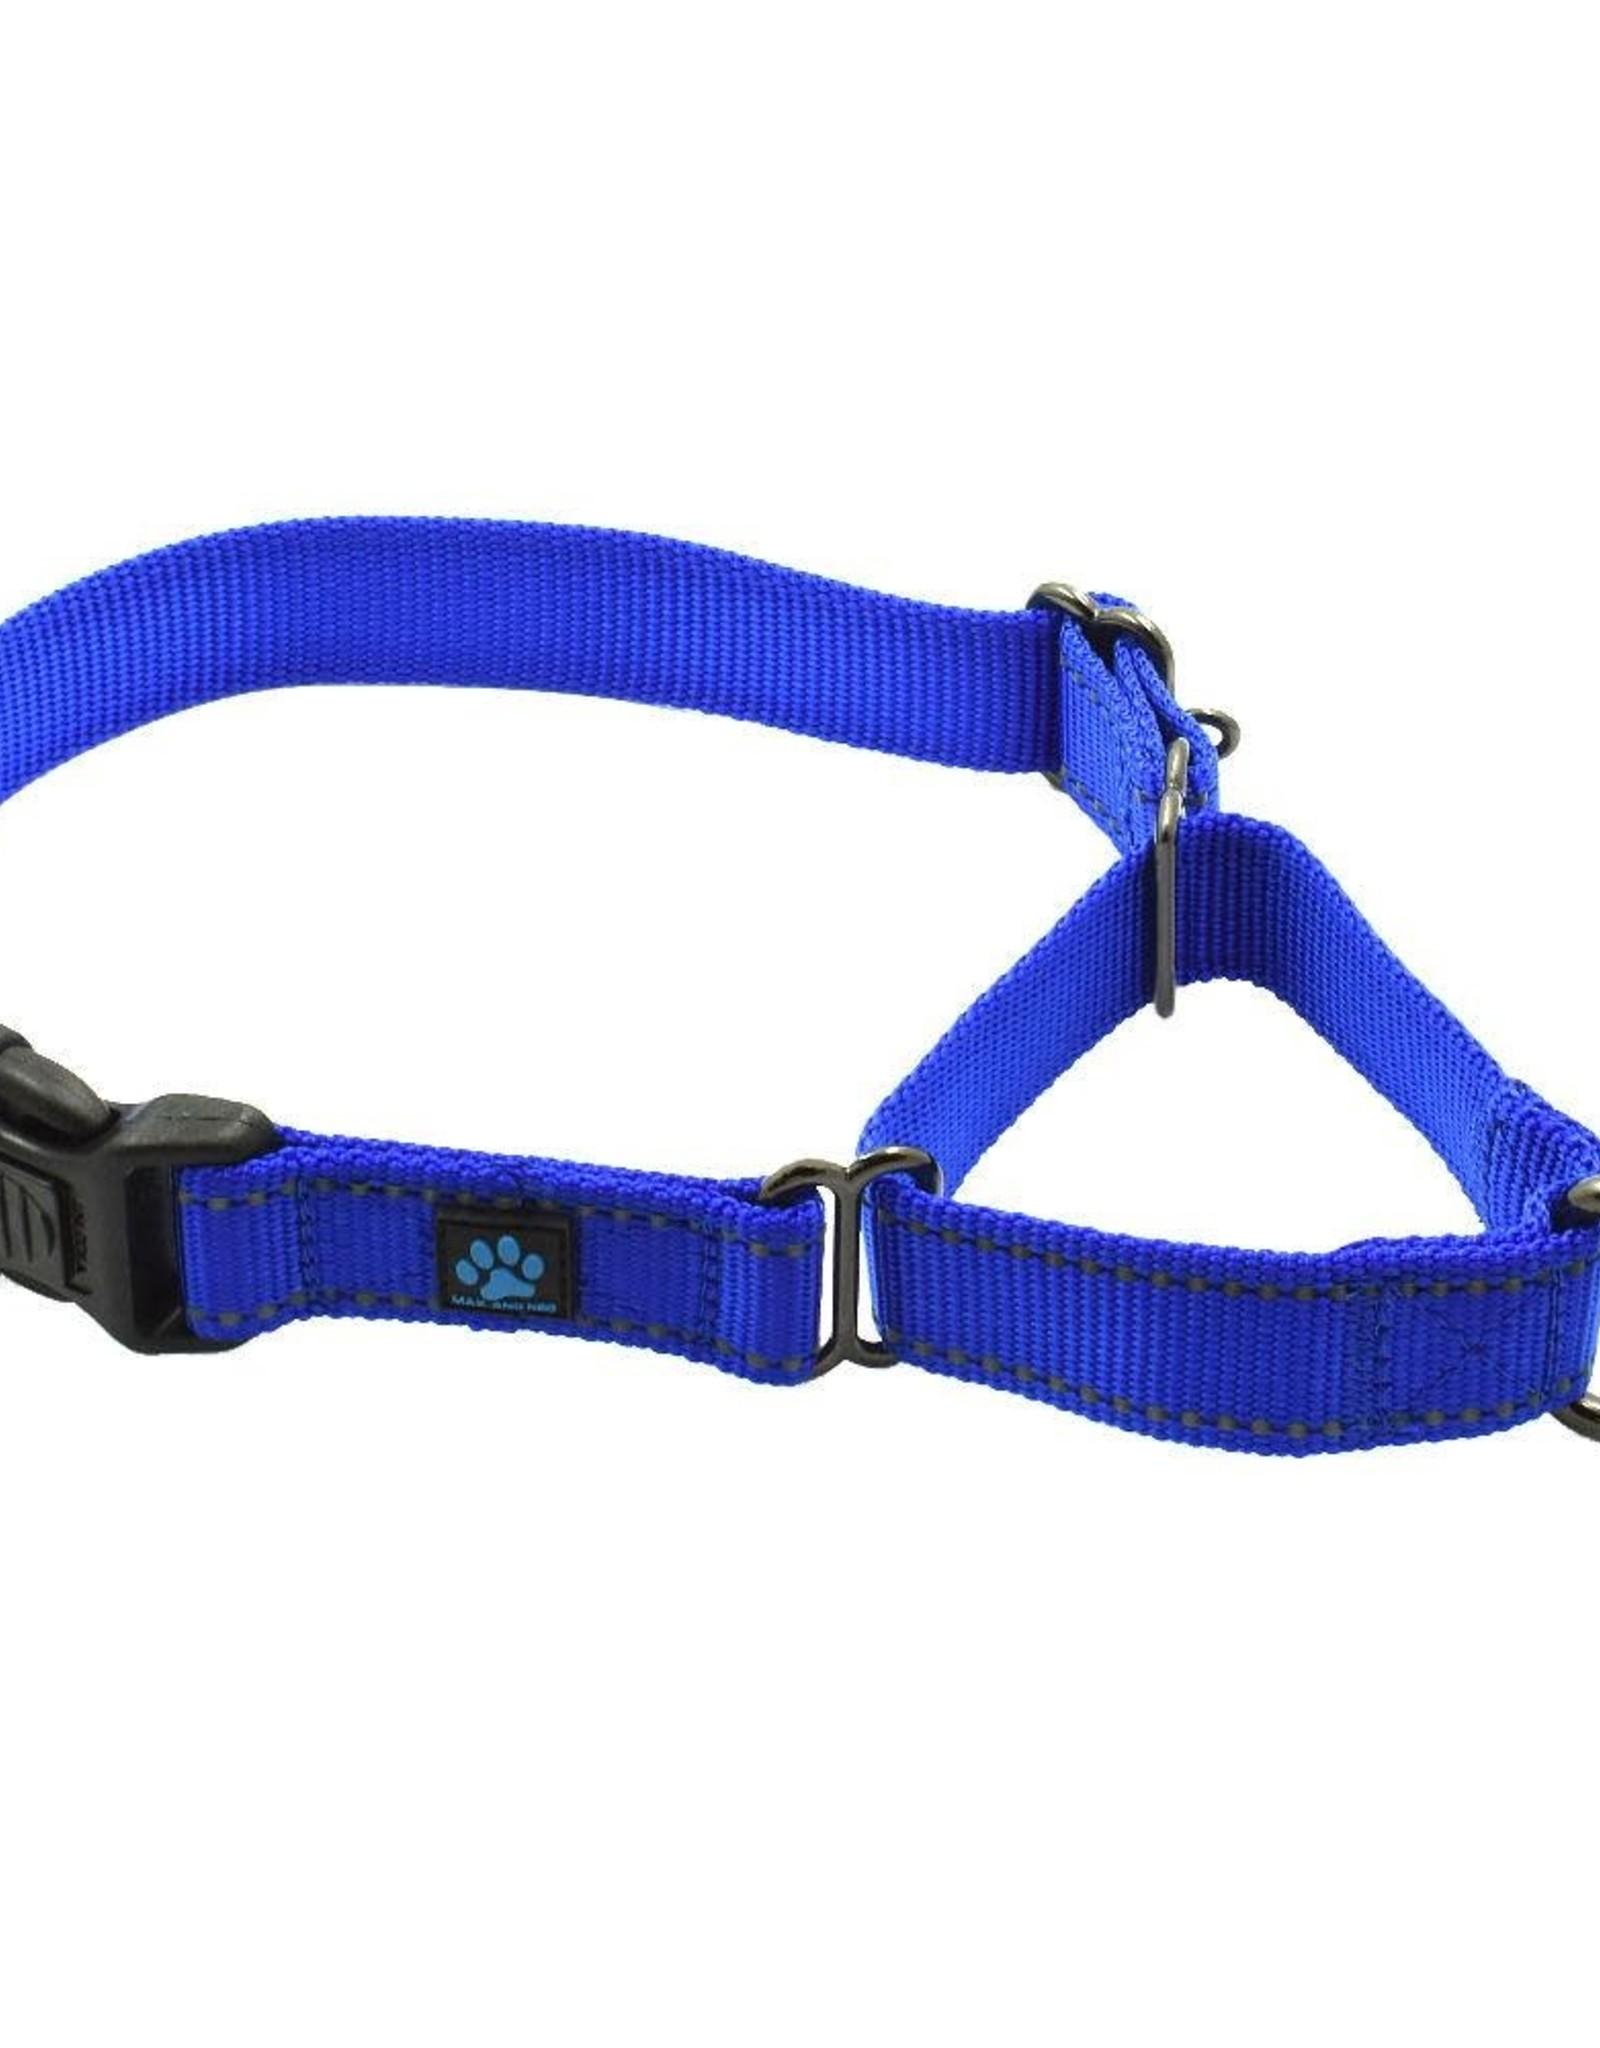 Max & Neo Nylon Martingale- XS Blue